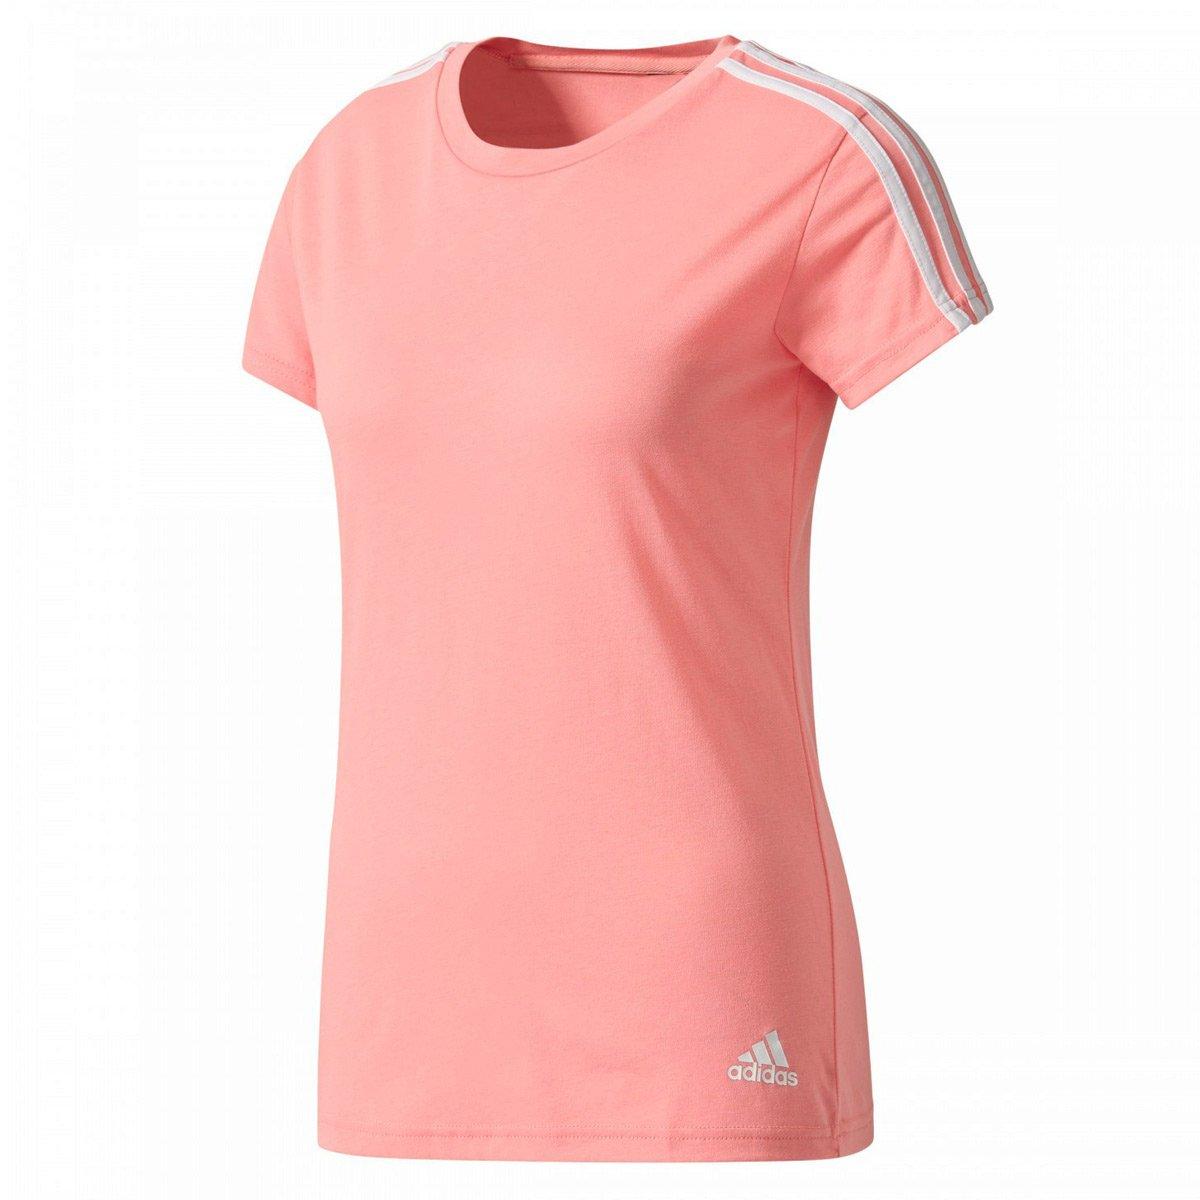 091e186f9 Camiseta Adidas Essentials 3 Stripes Feminina | Treino e Corrida